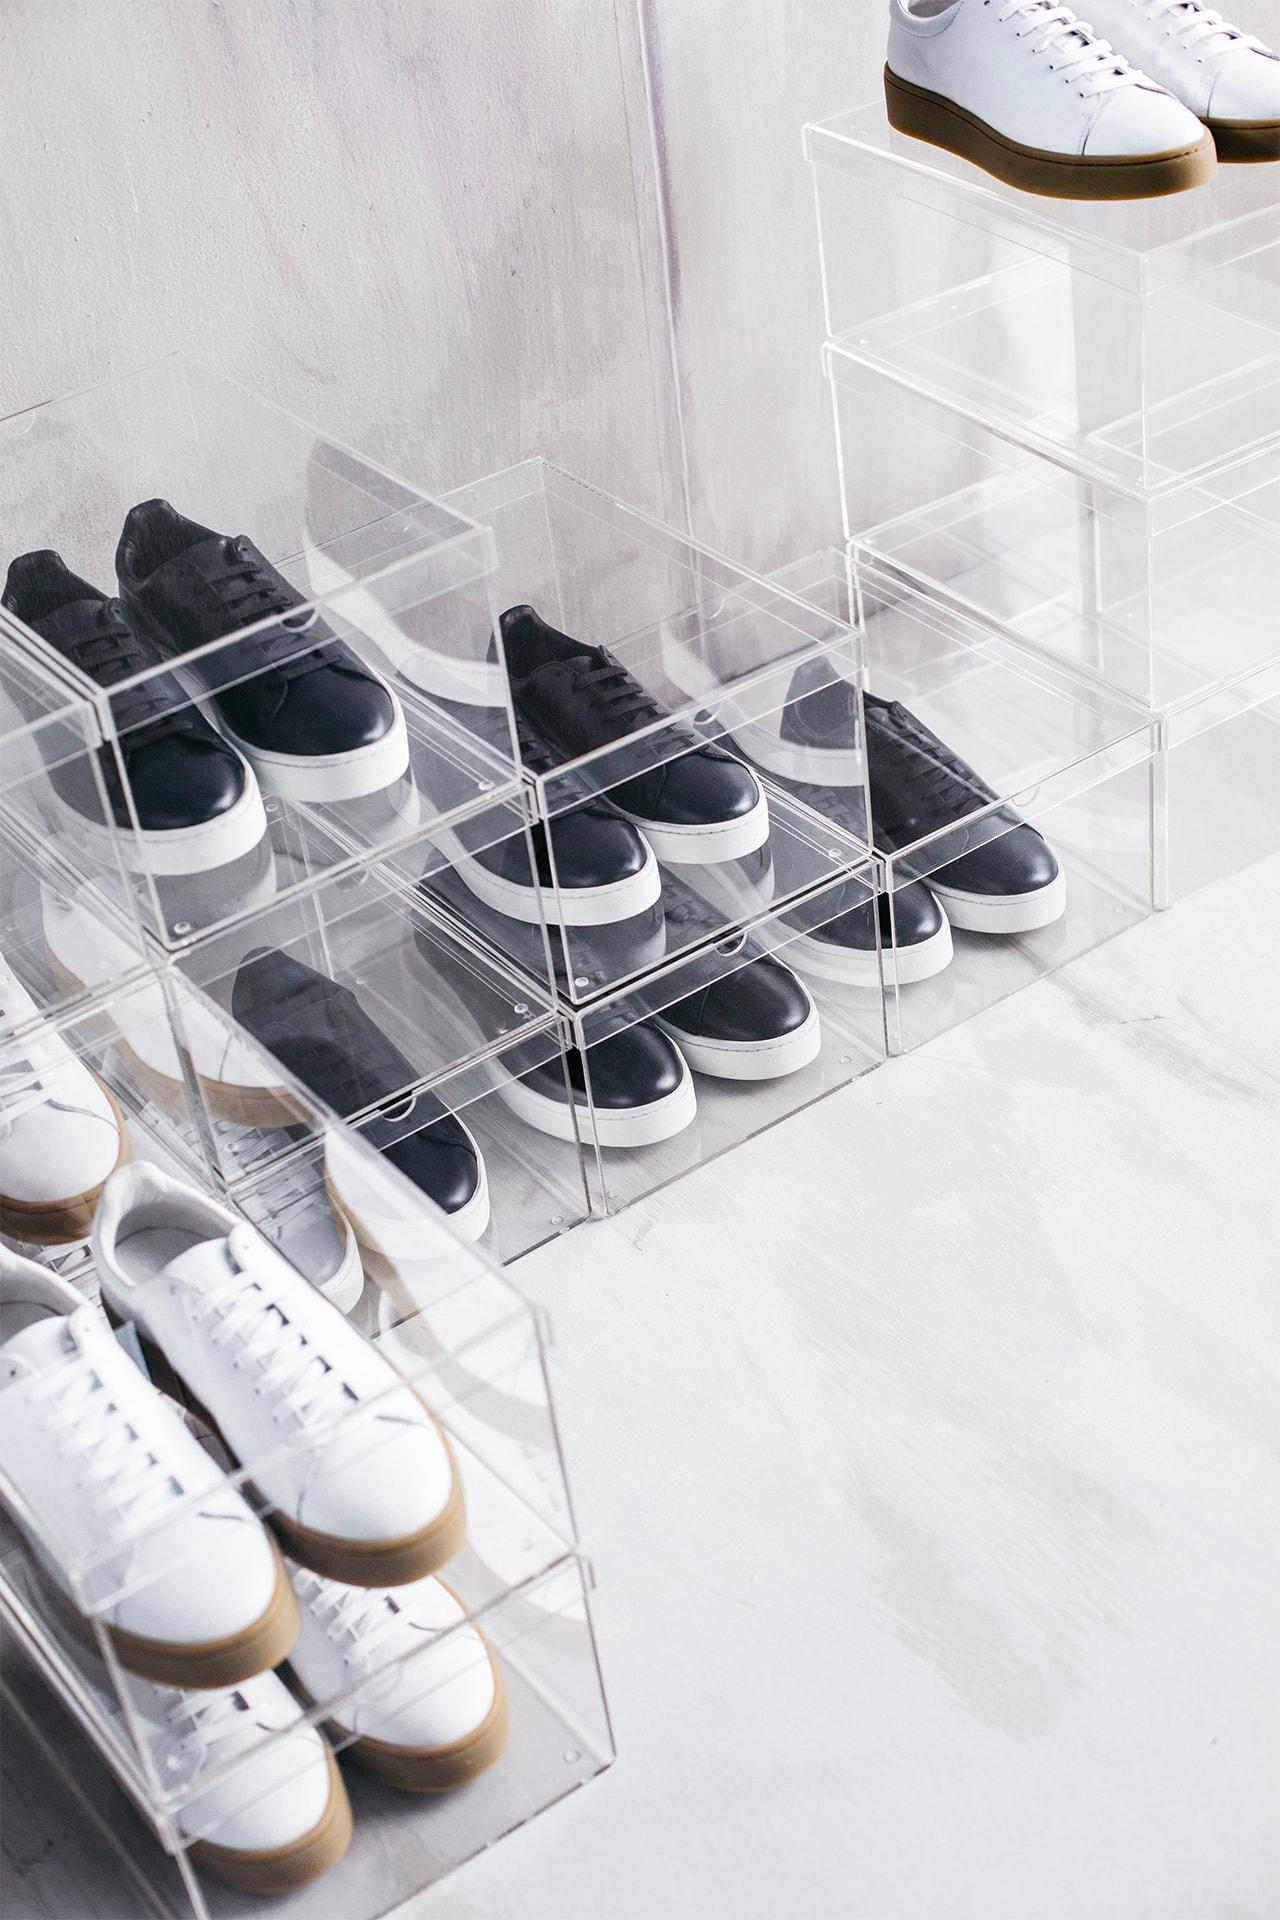 Sneaker Sneakers Shelf Clear Drawers Home Decor Comme Des Garcons Plastic Bag Prada Shoe Boxes Streetwear Fashion